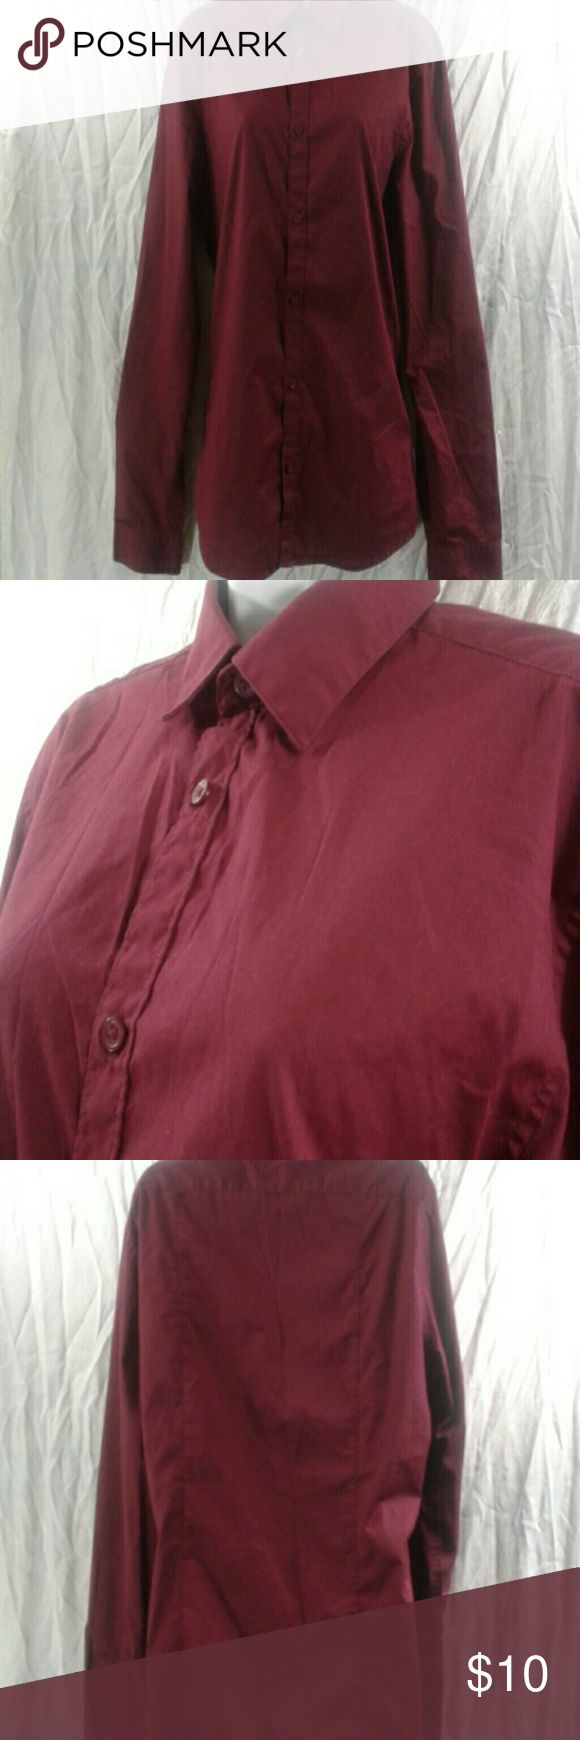 H&M maroon dress shirt- medium H&M maroon dress shirt. Maroon long sleeve. Good condition, gently used.  Great for work! H&M Shirts Dress Shirts